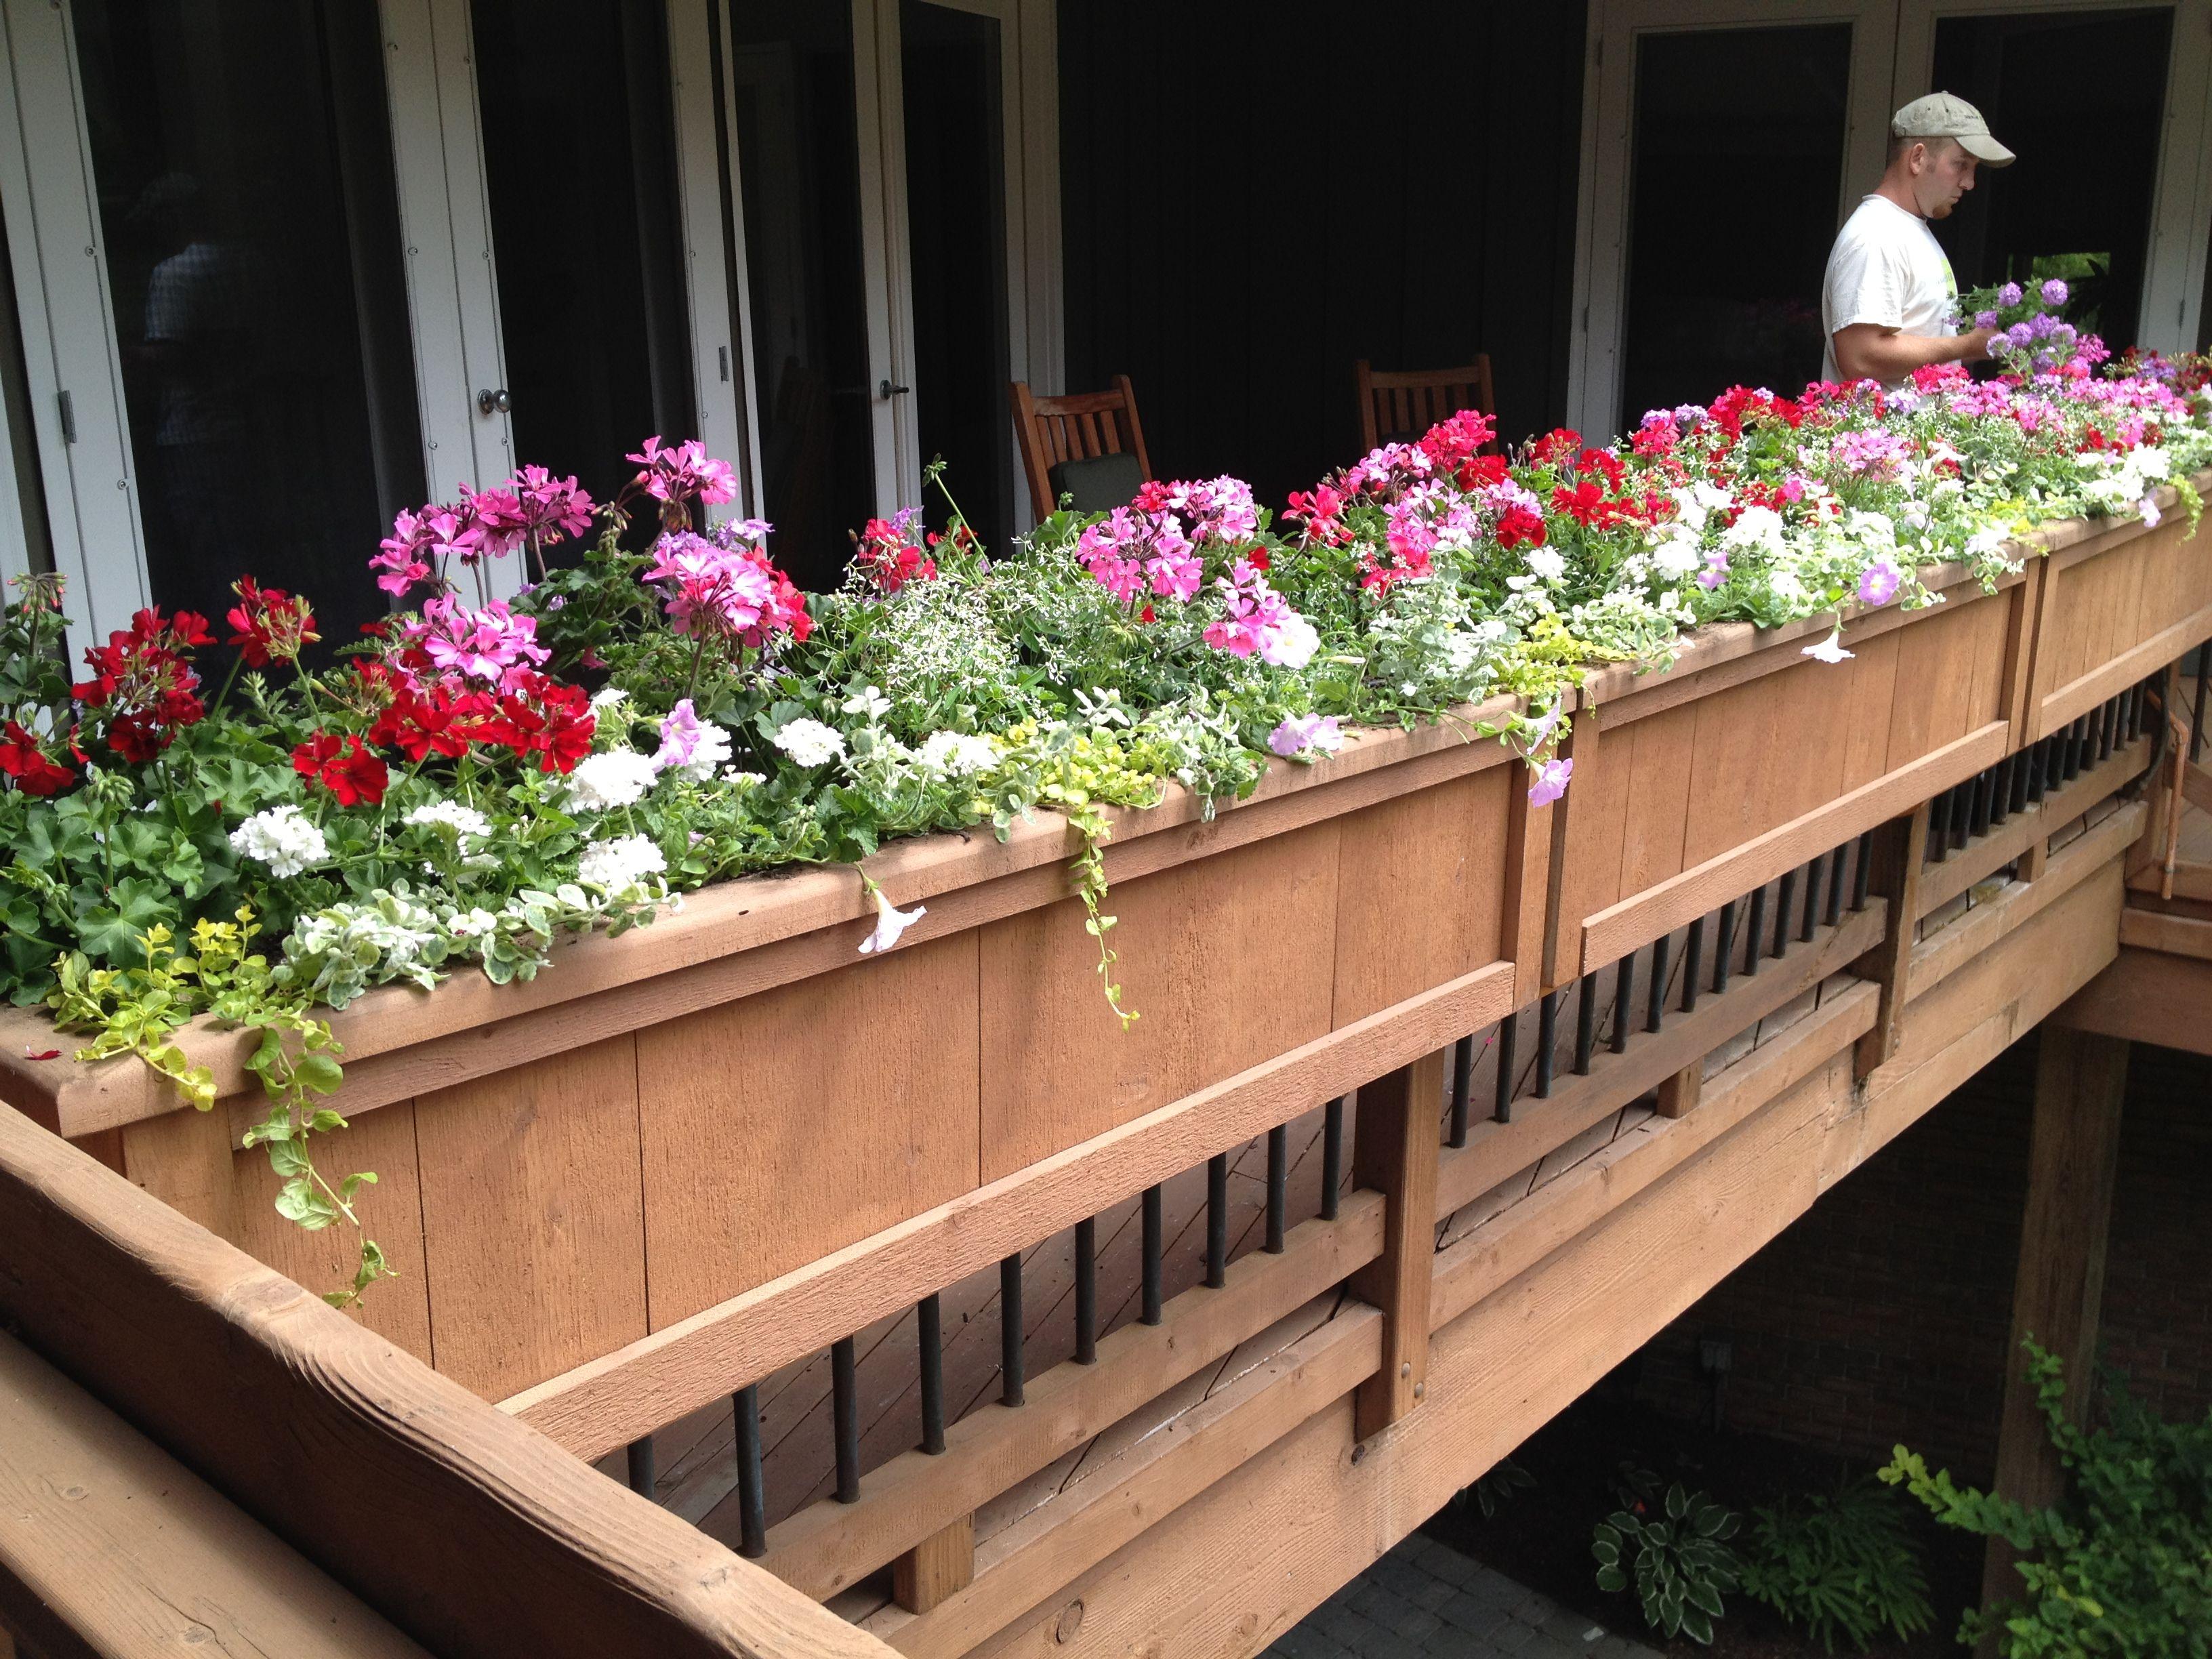 Long Box Deck Railing Planters Railing Planters Railing Planter Boxes